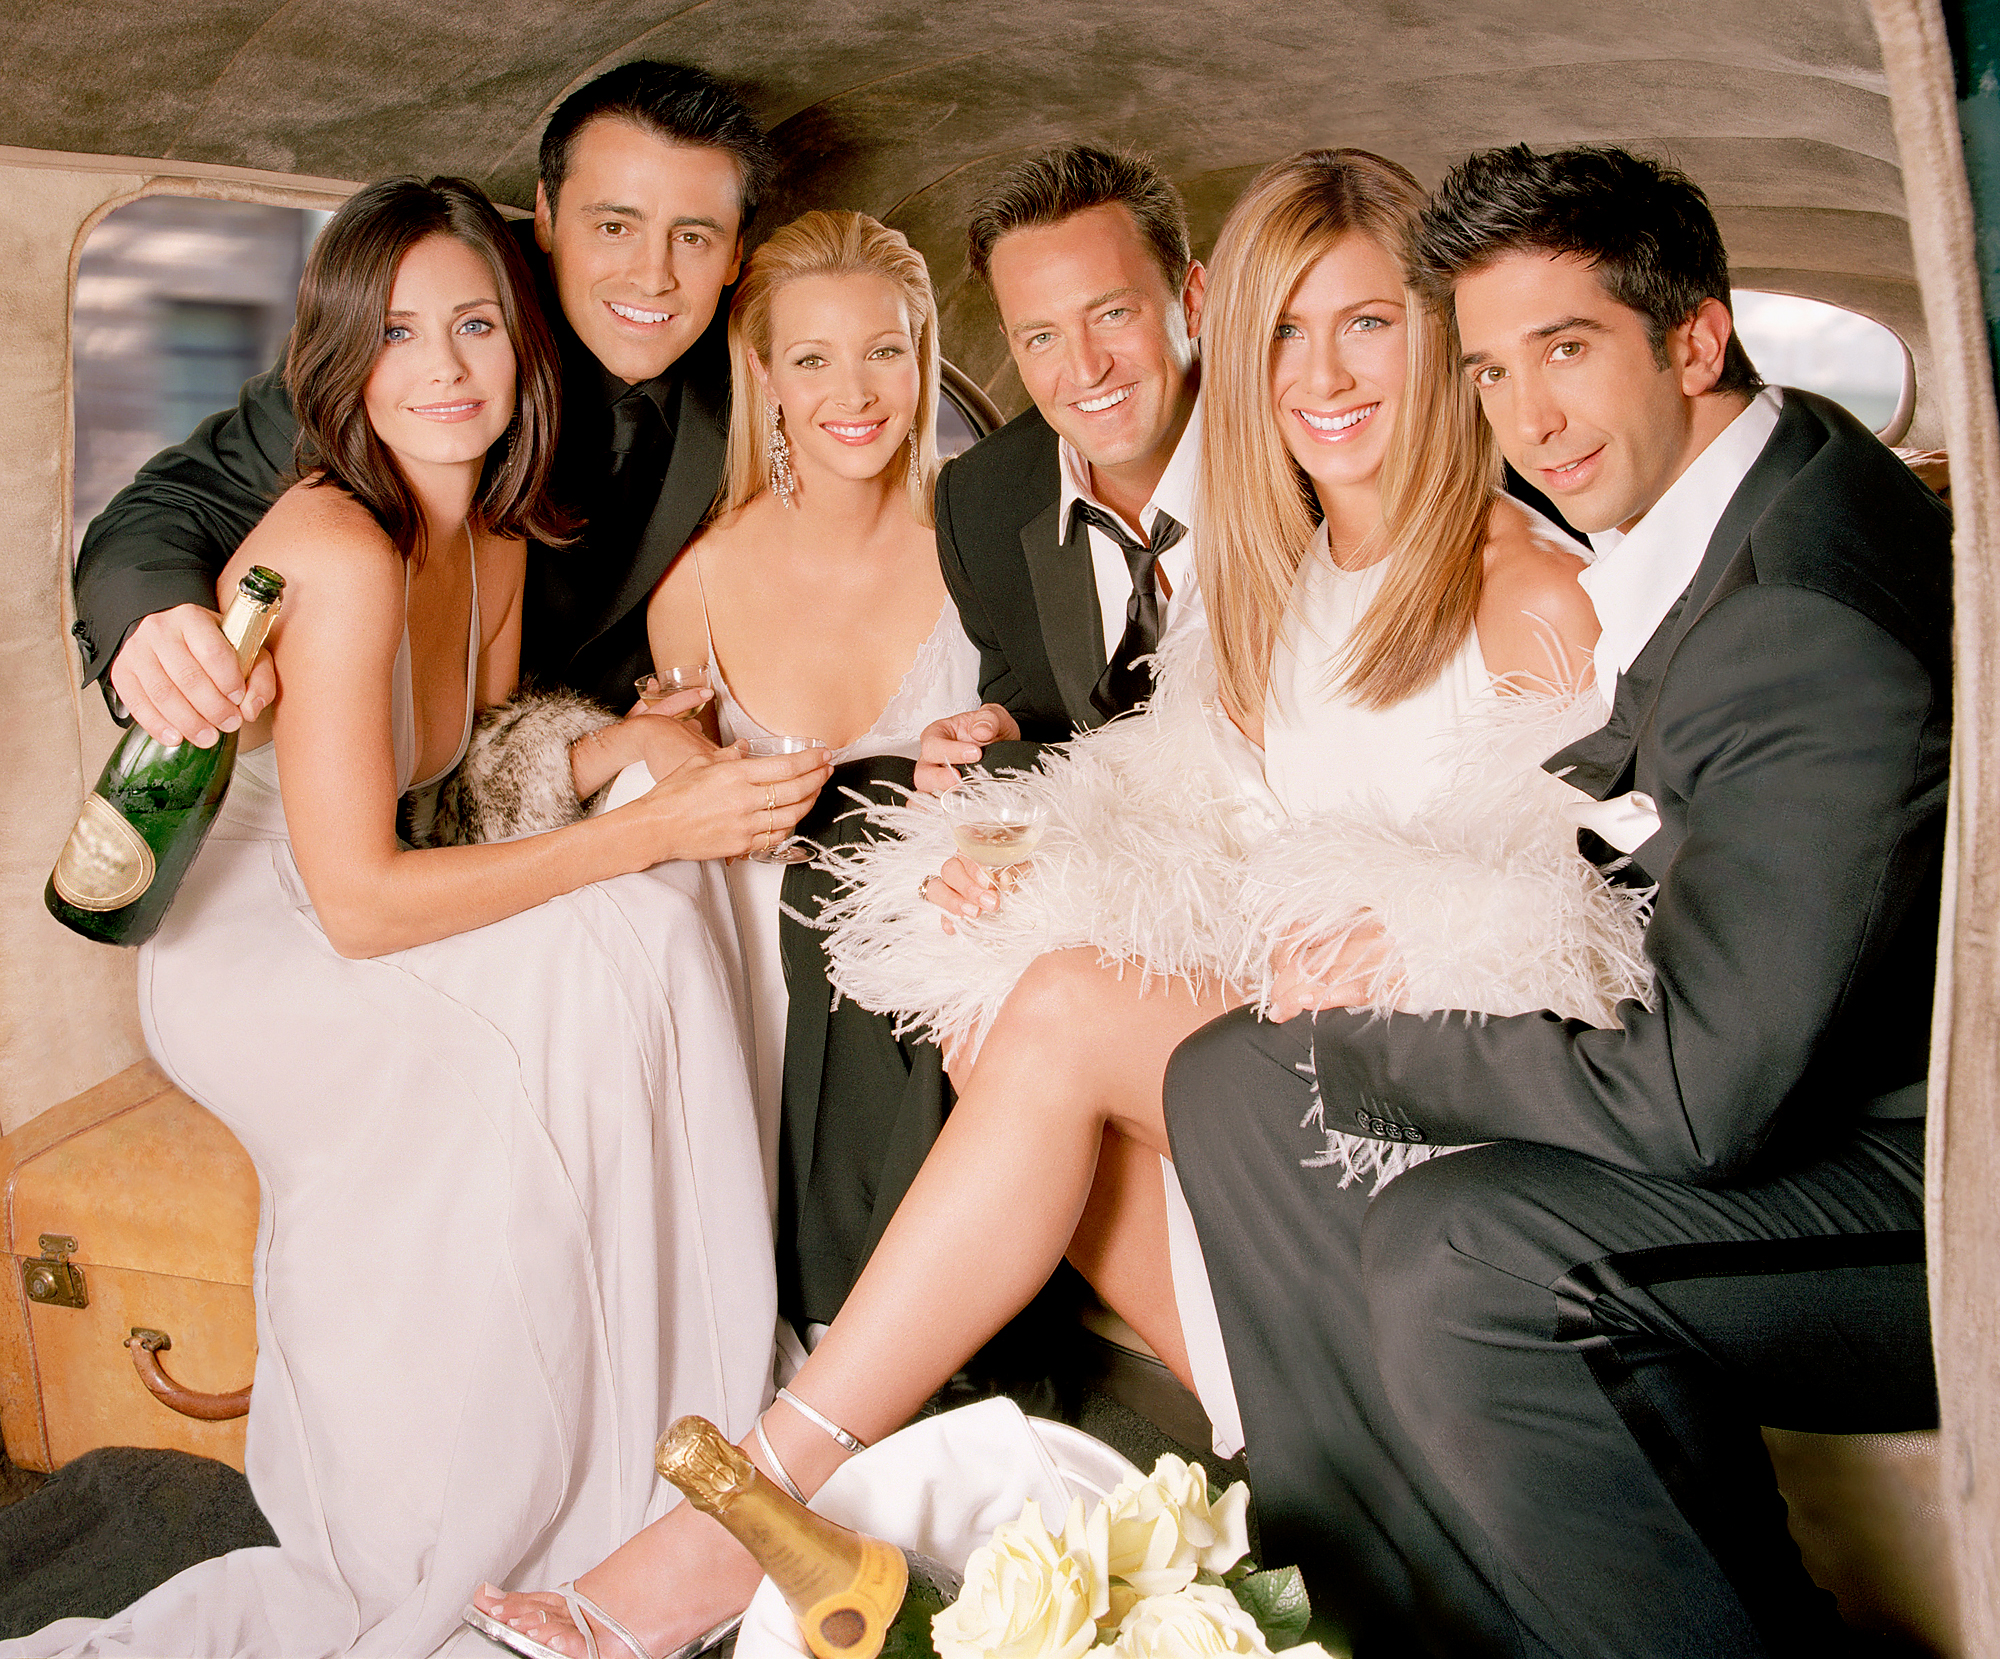 Friends-Series-Finale-15-years